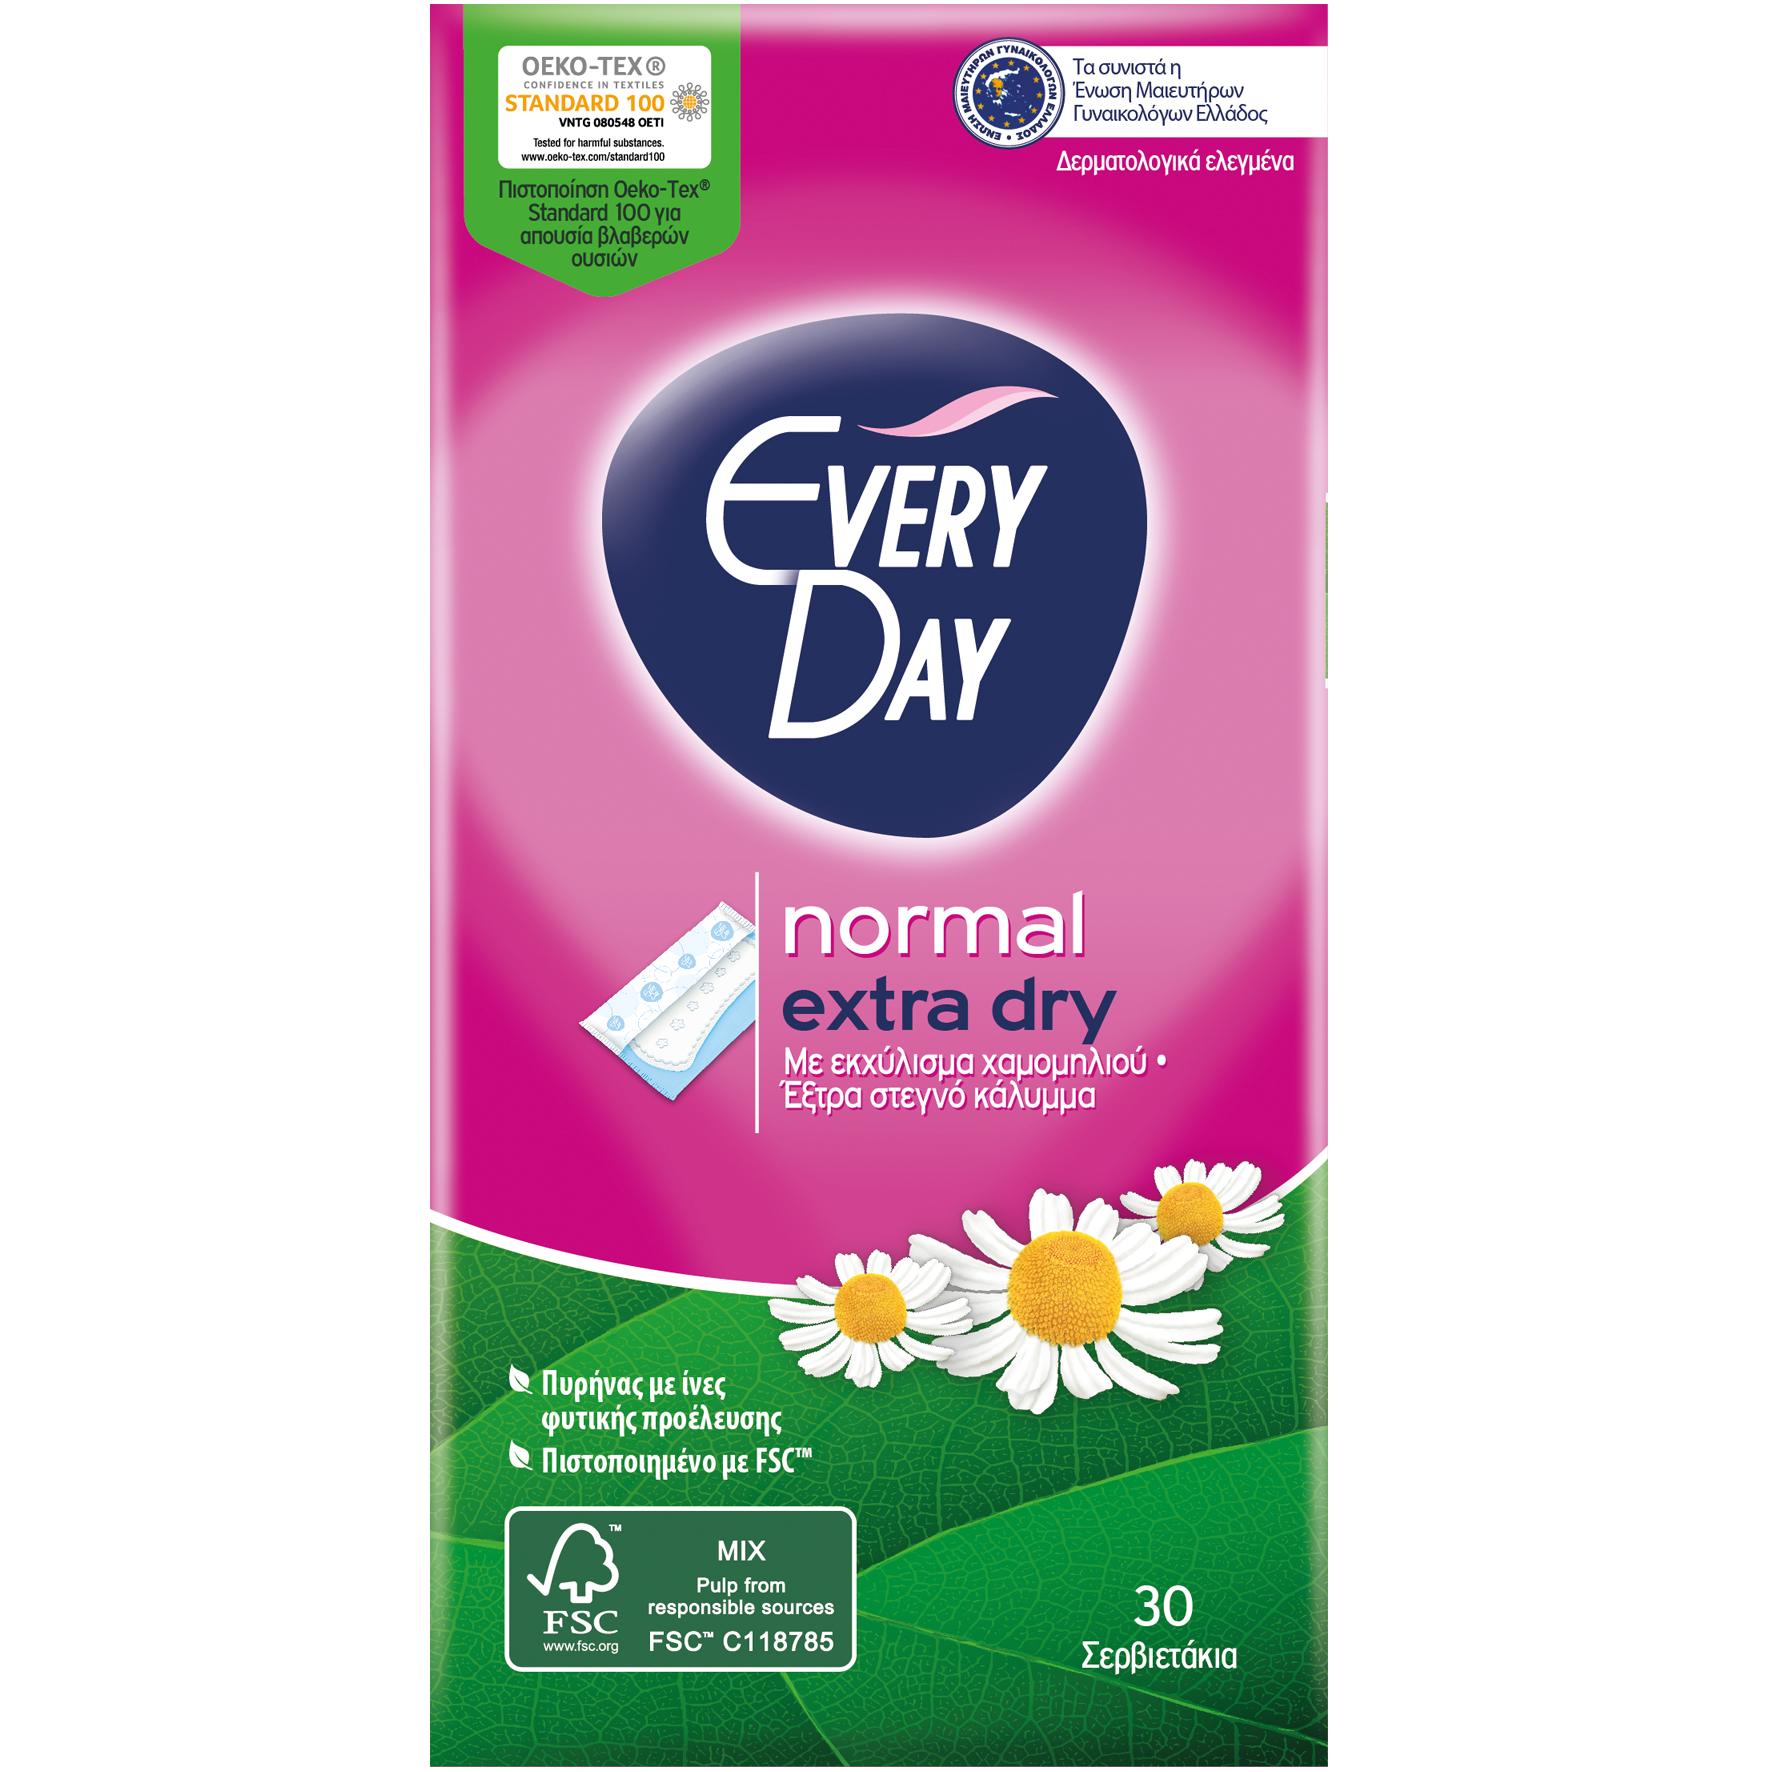 Every Day Extra Dry Normal Ανατομικά Σερβιετάκια με Έξτρα Στεγνό Κάλυμμα & Εκχύλισμα Χαμομηλιού 30 Τεμάχια